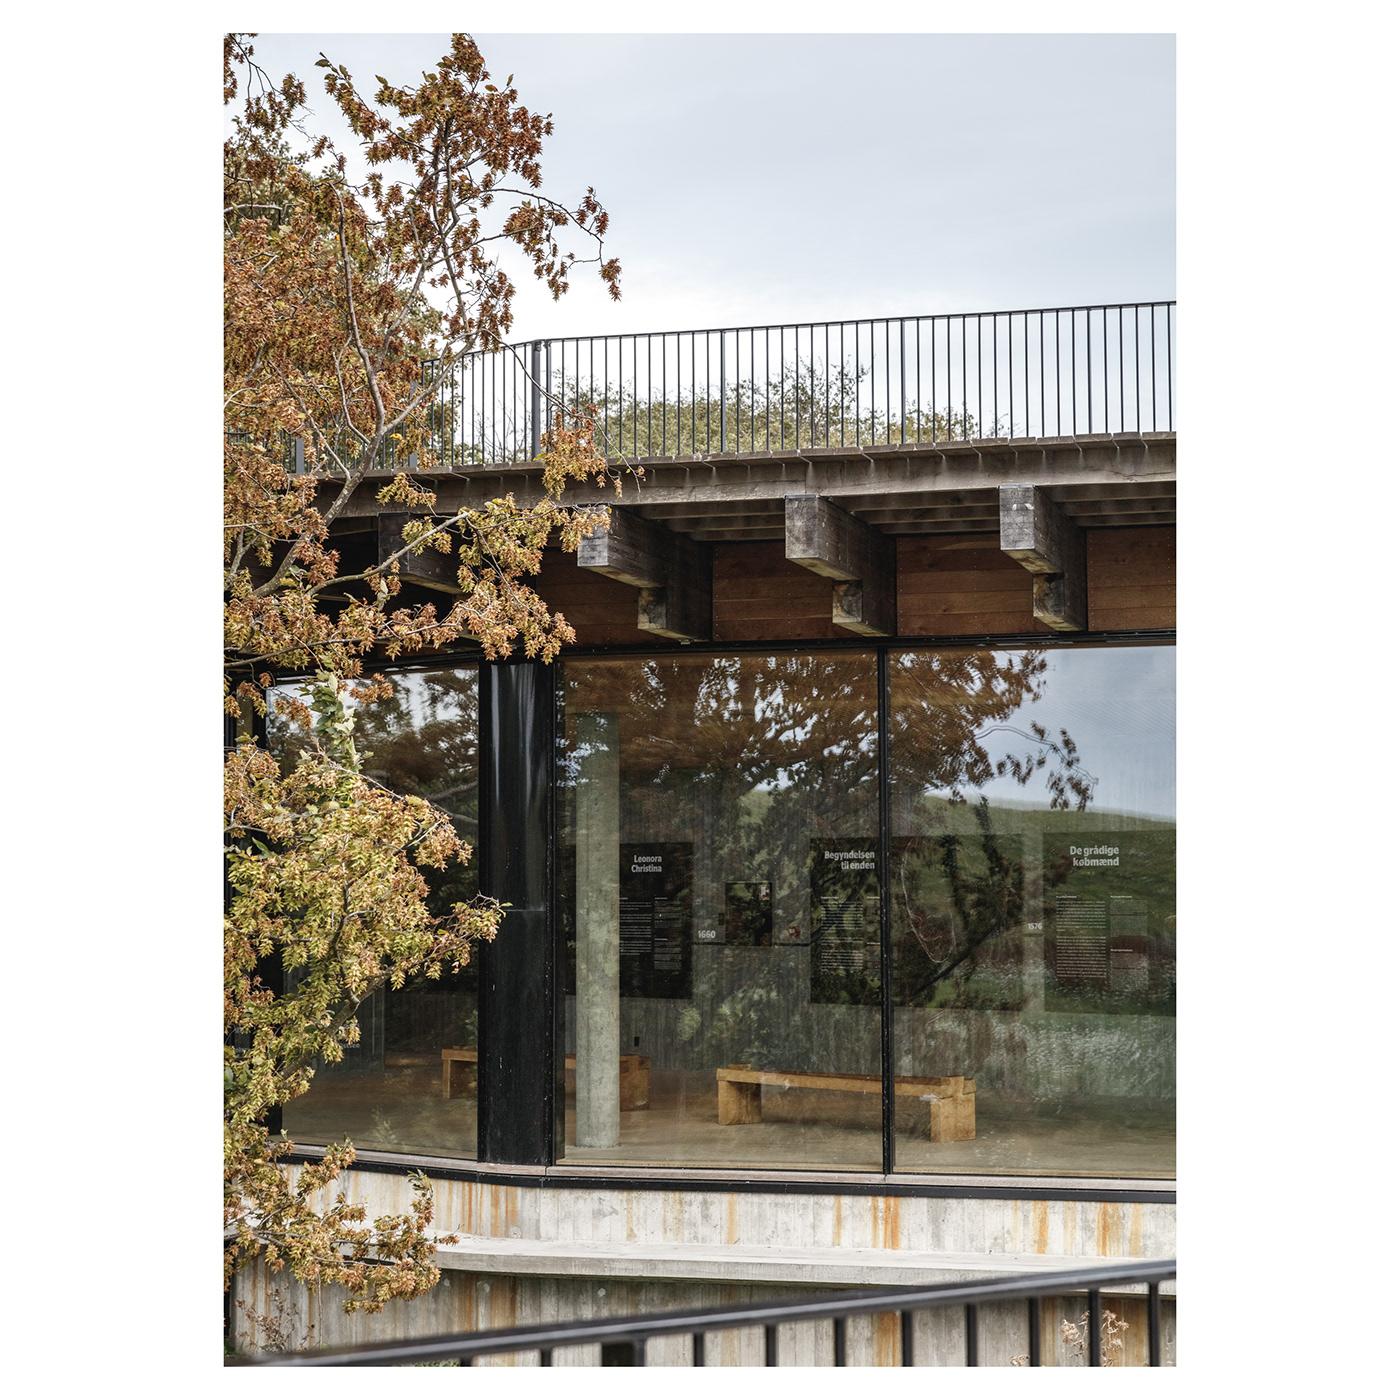 Image may contain: tree and bridge